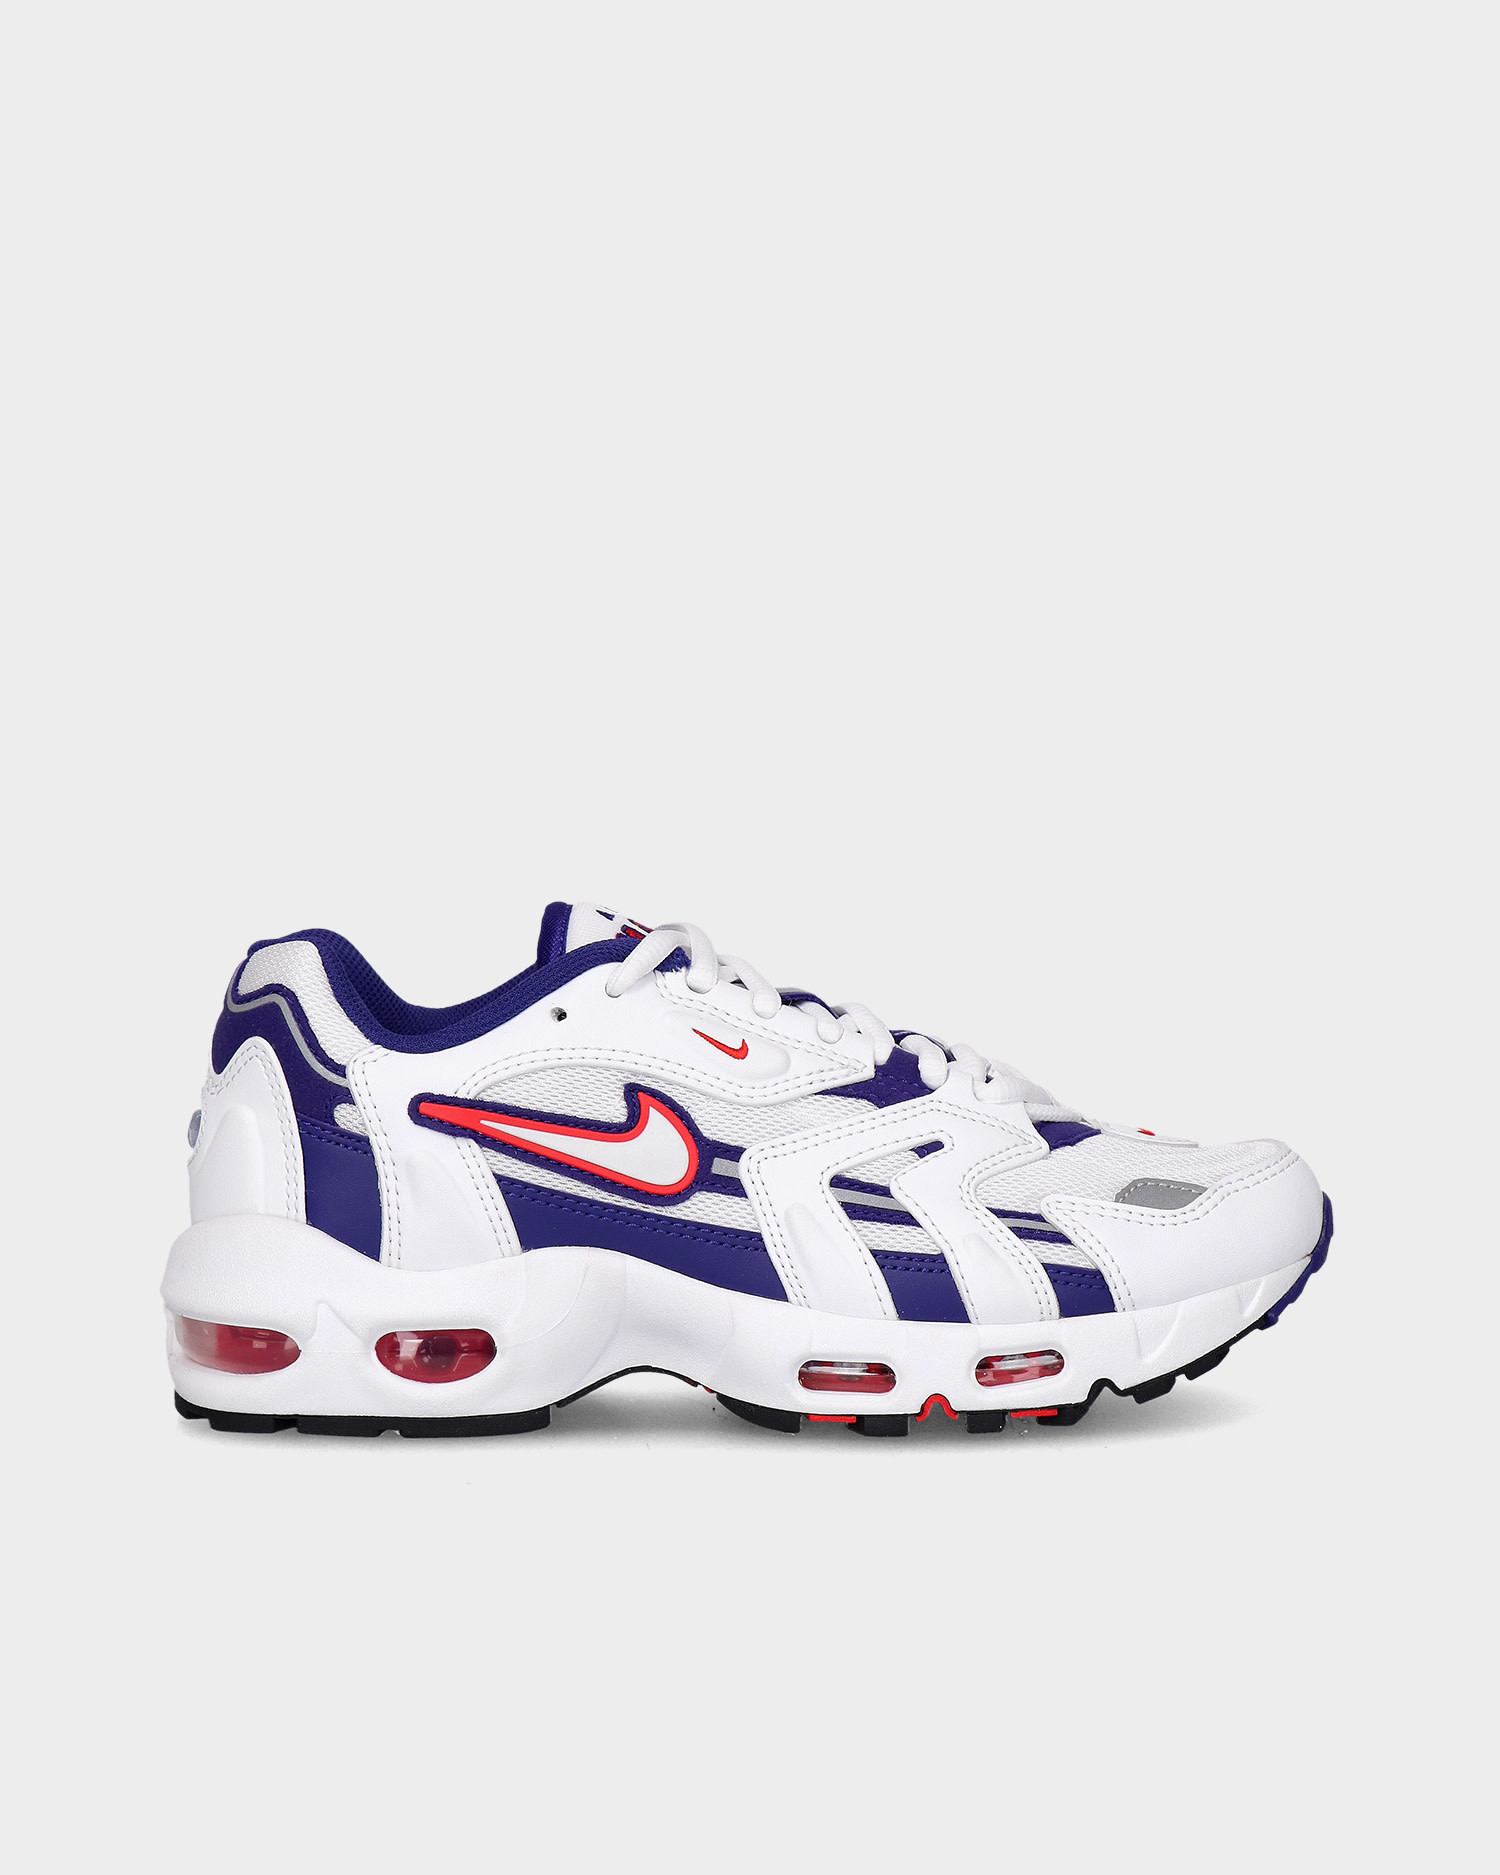 Nike W air max 96 ii White/comet red-grape ice